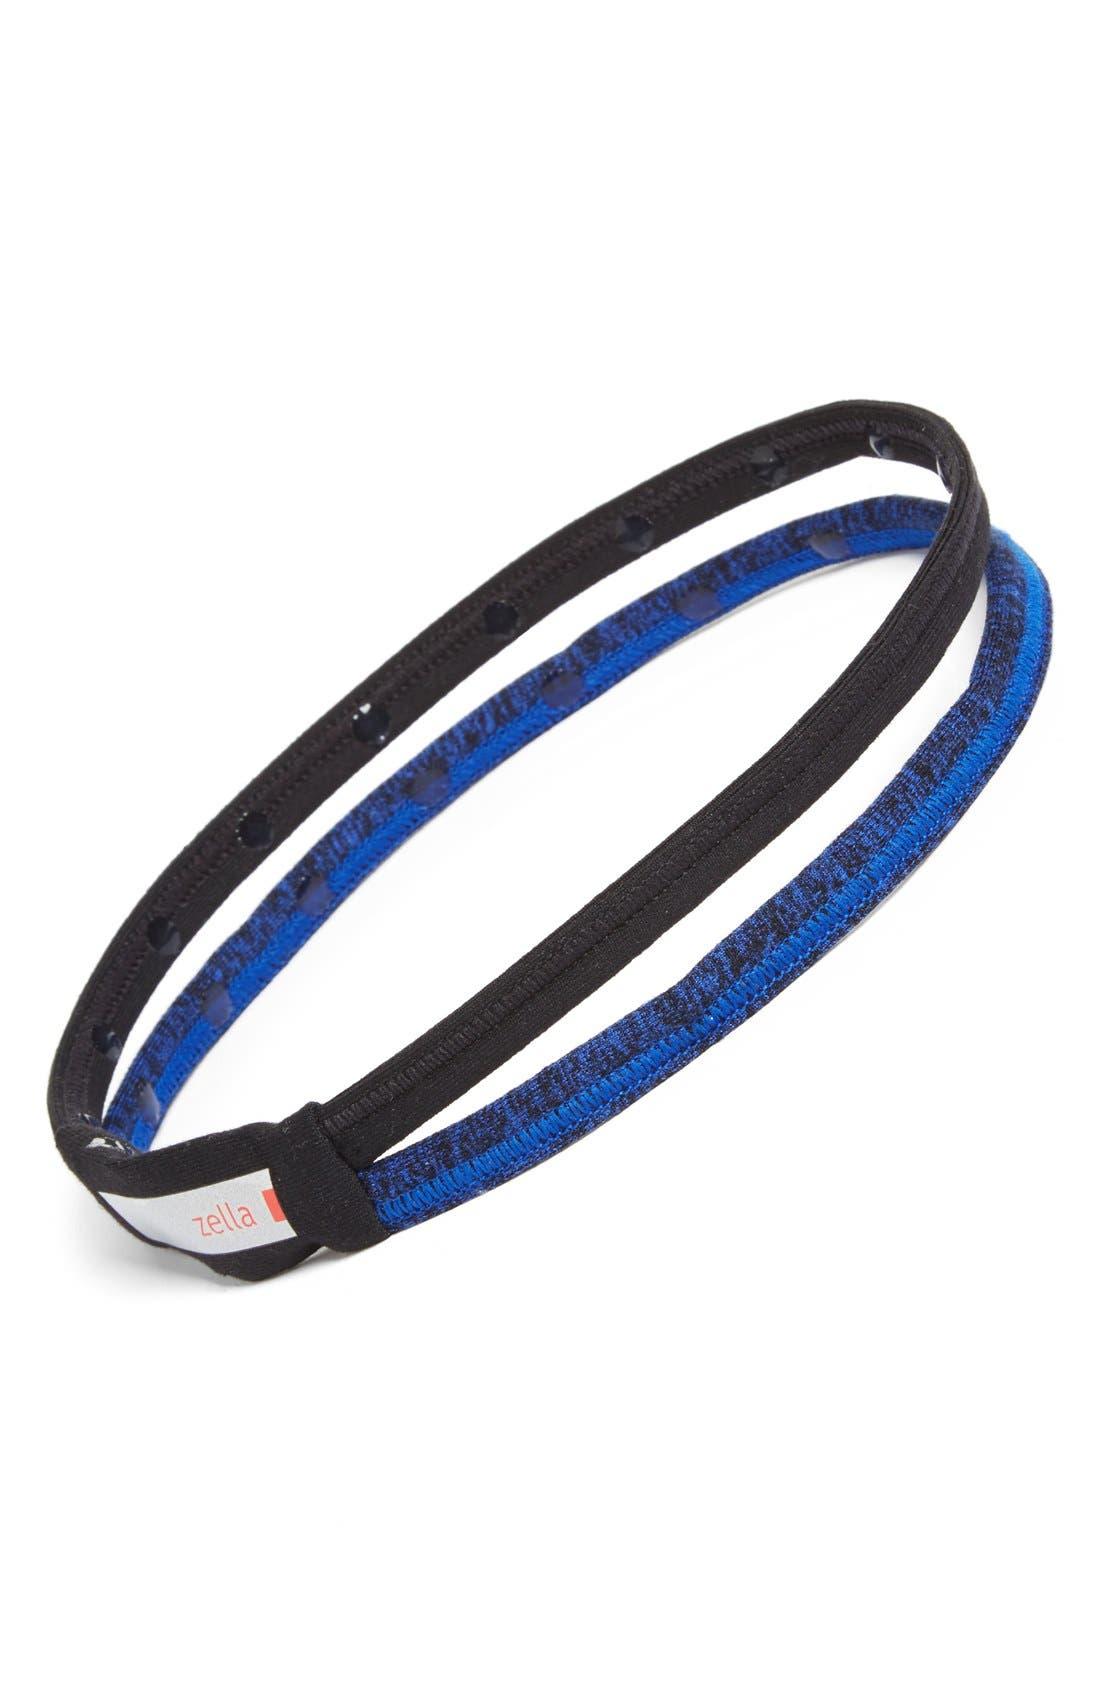 Main Image - Zella 'Double the Fun' Colorblock Headband